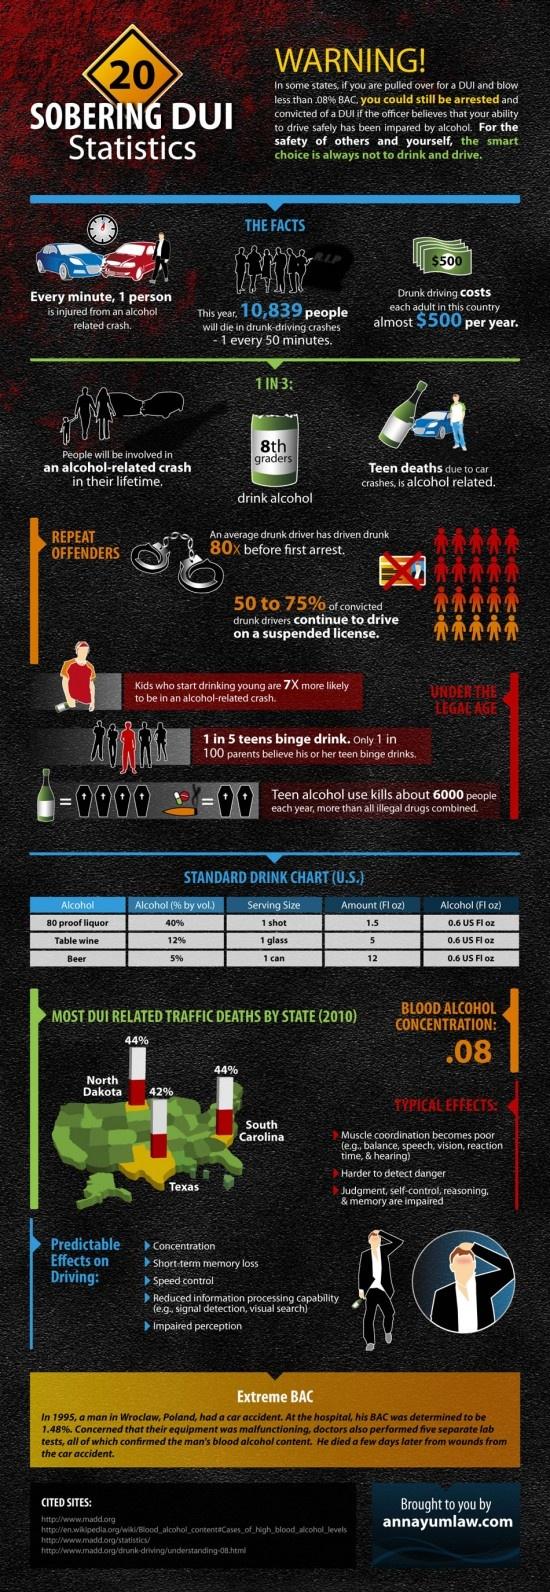 INFOGRAPHIC: 20 SOBERING DUI STATISTICS